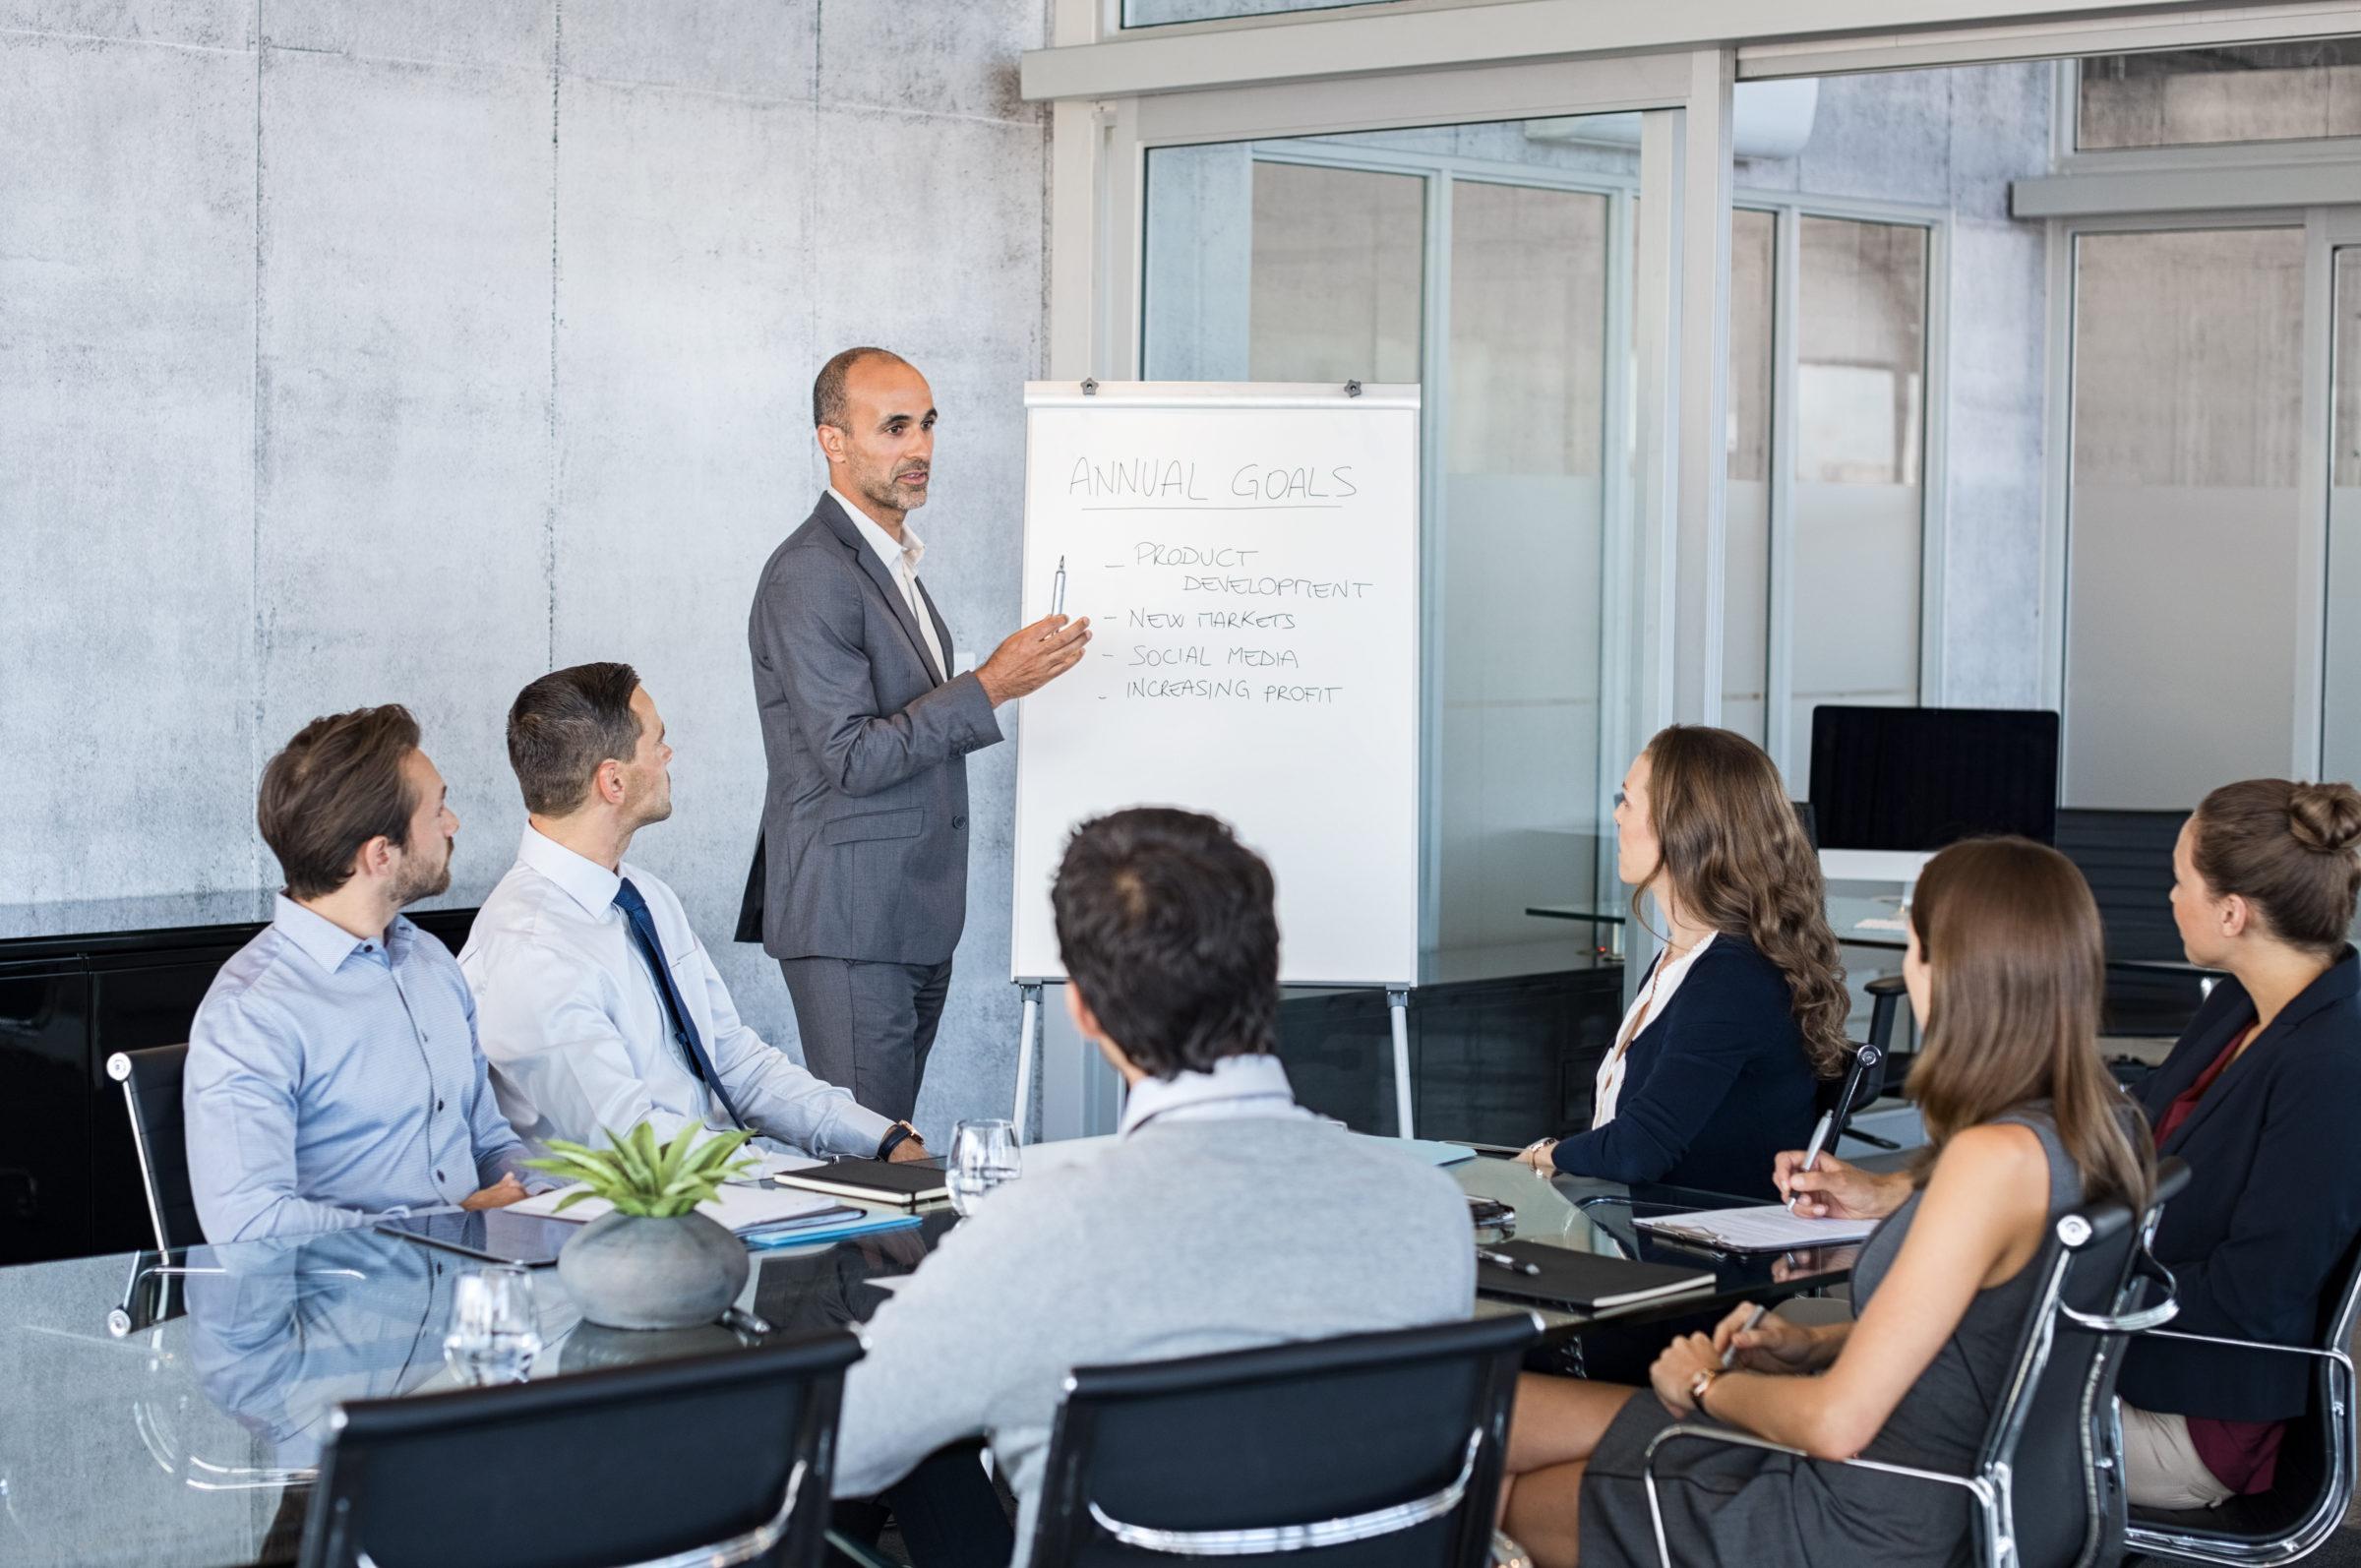 leader briefing business people PJECLTE